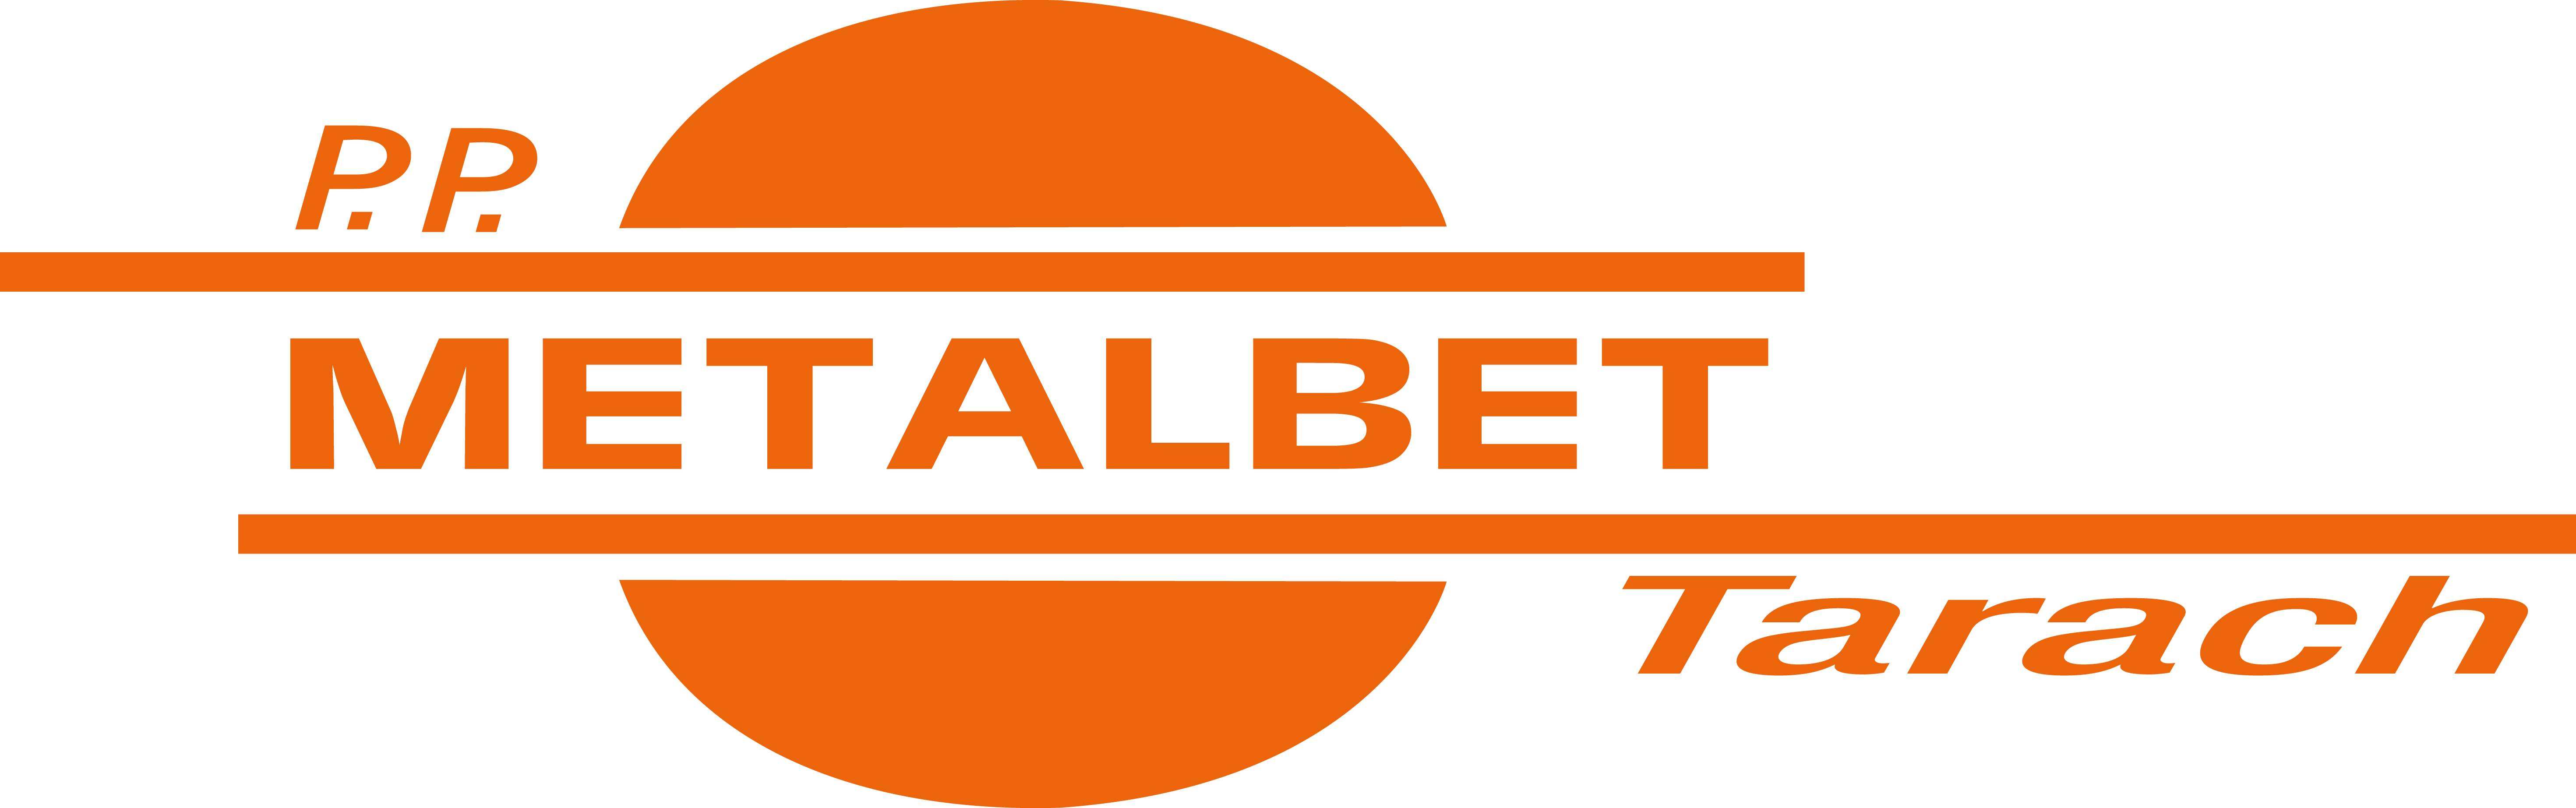 METALBET